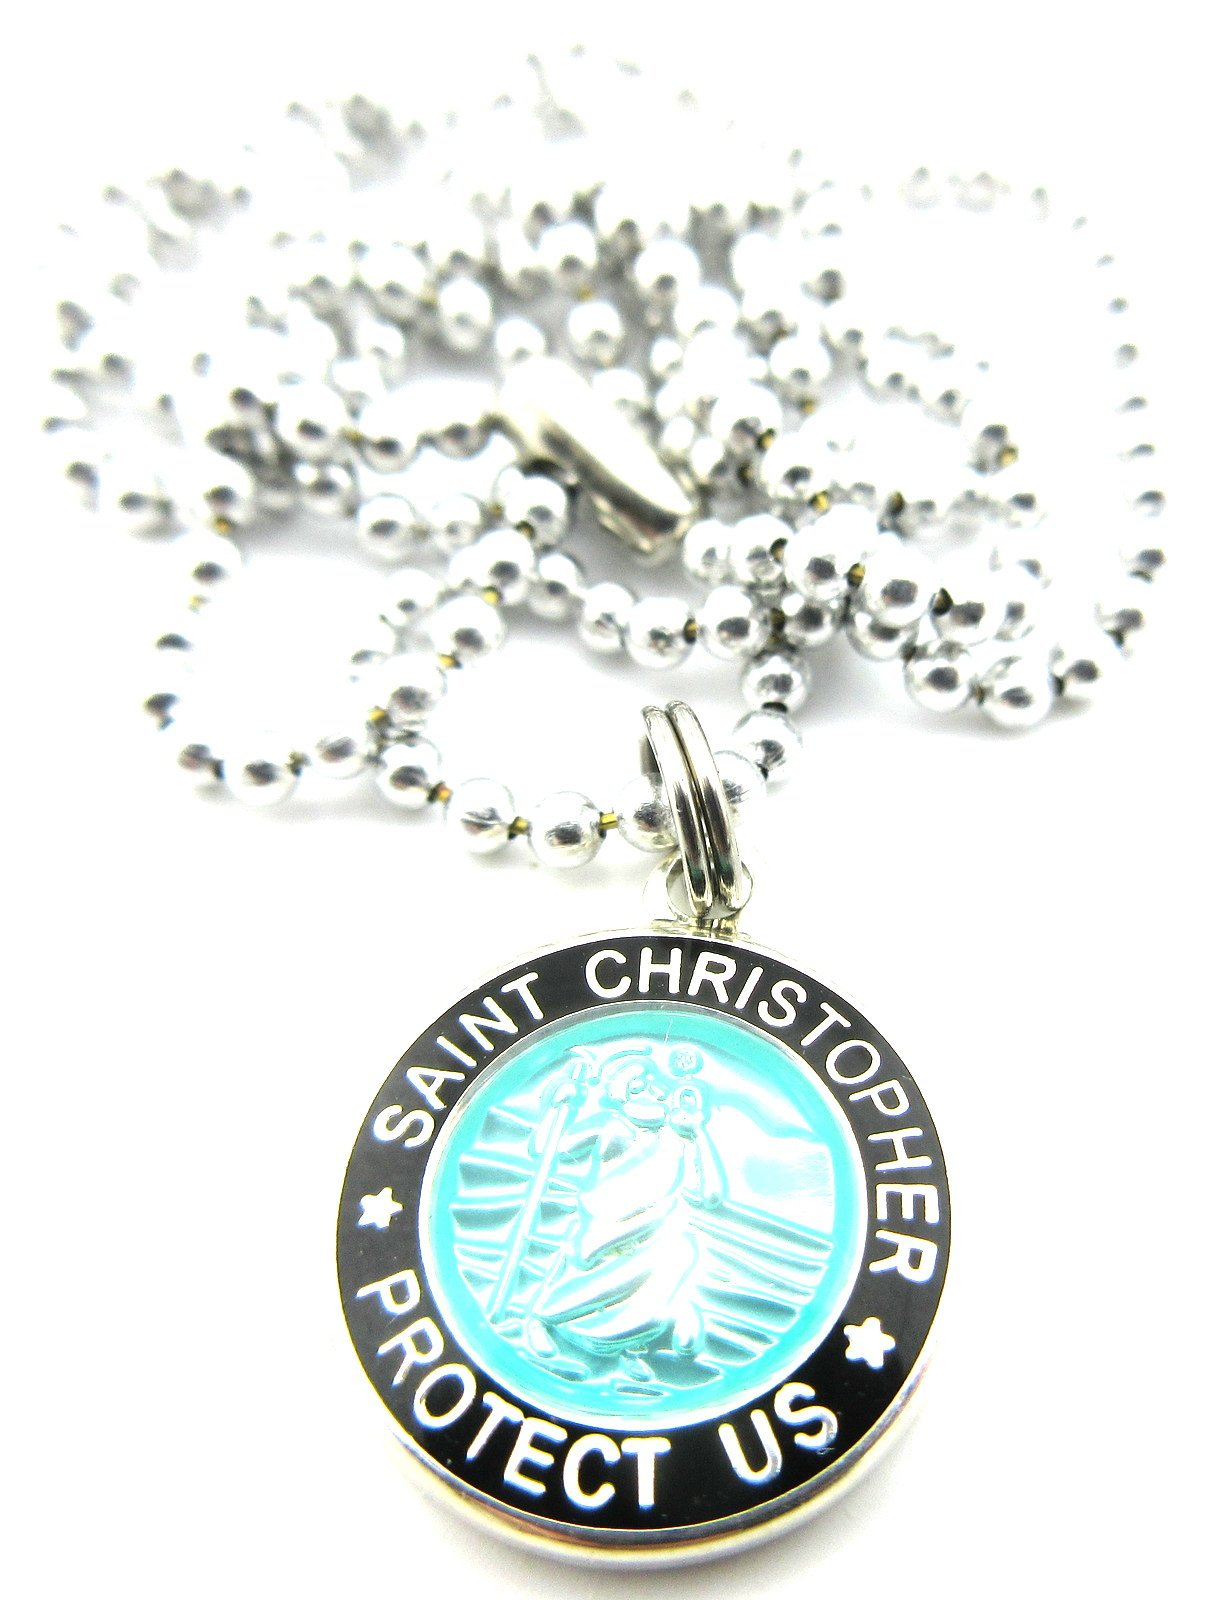 Mini St Christopher Surf Medal Pendant Necklace,Aquamarine/Black AQ/BK by Get Back Supply Co (Image #1)